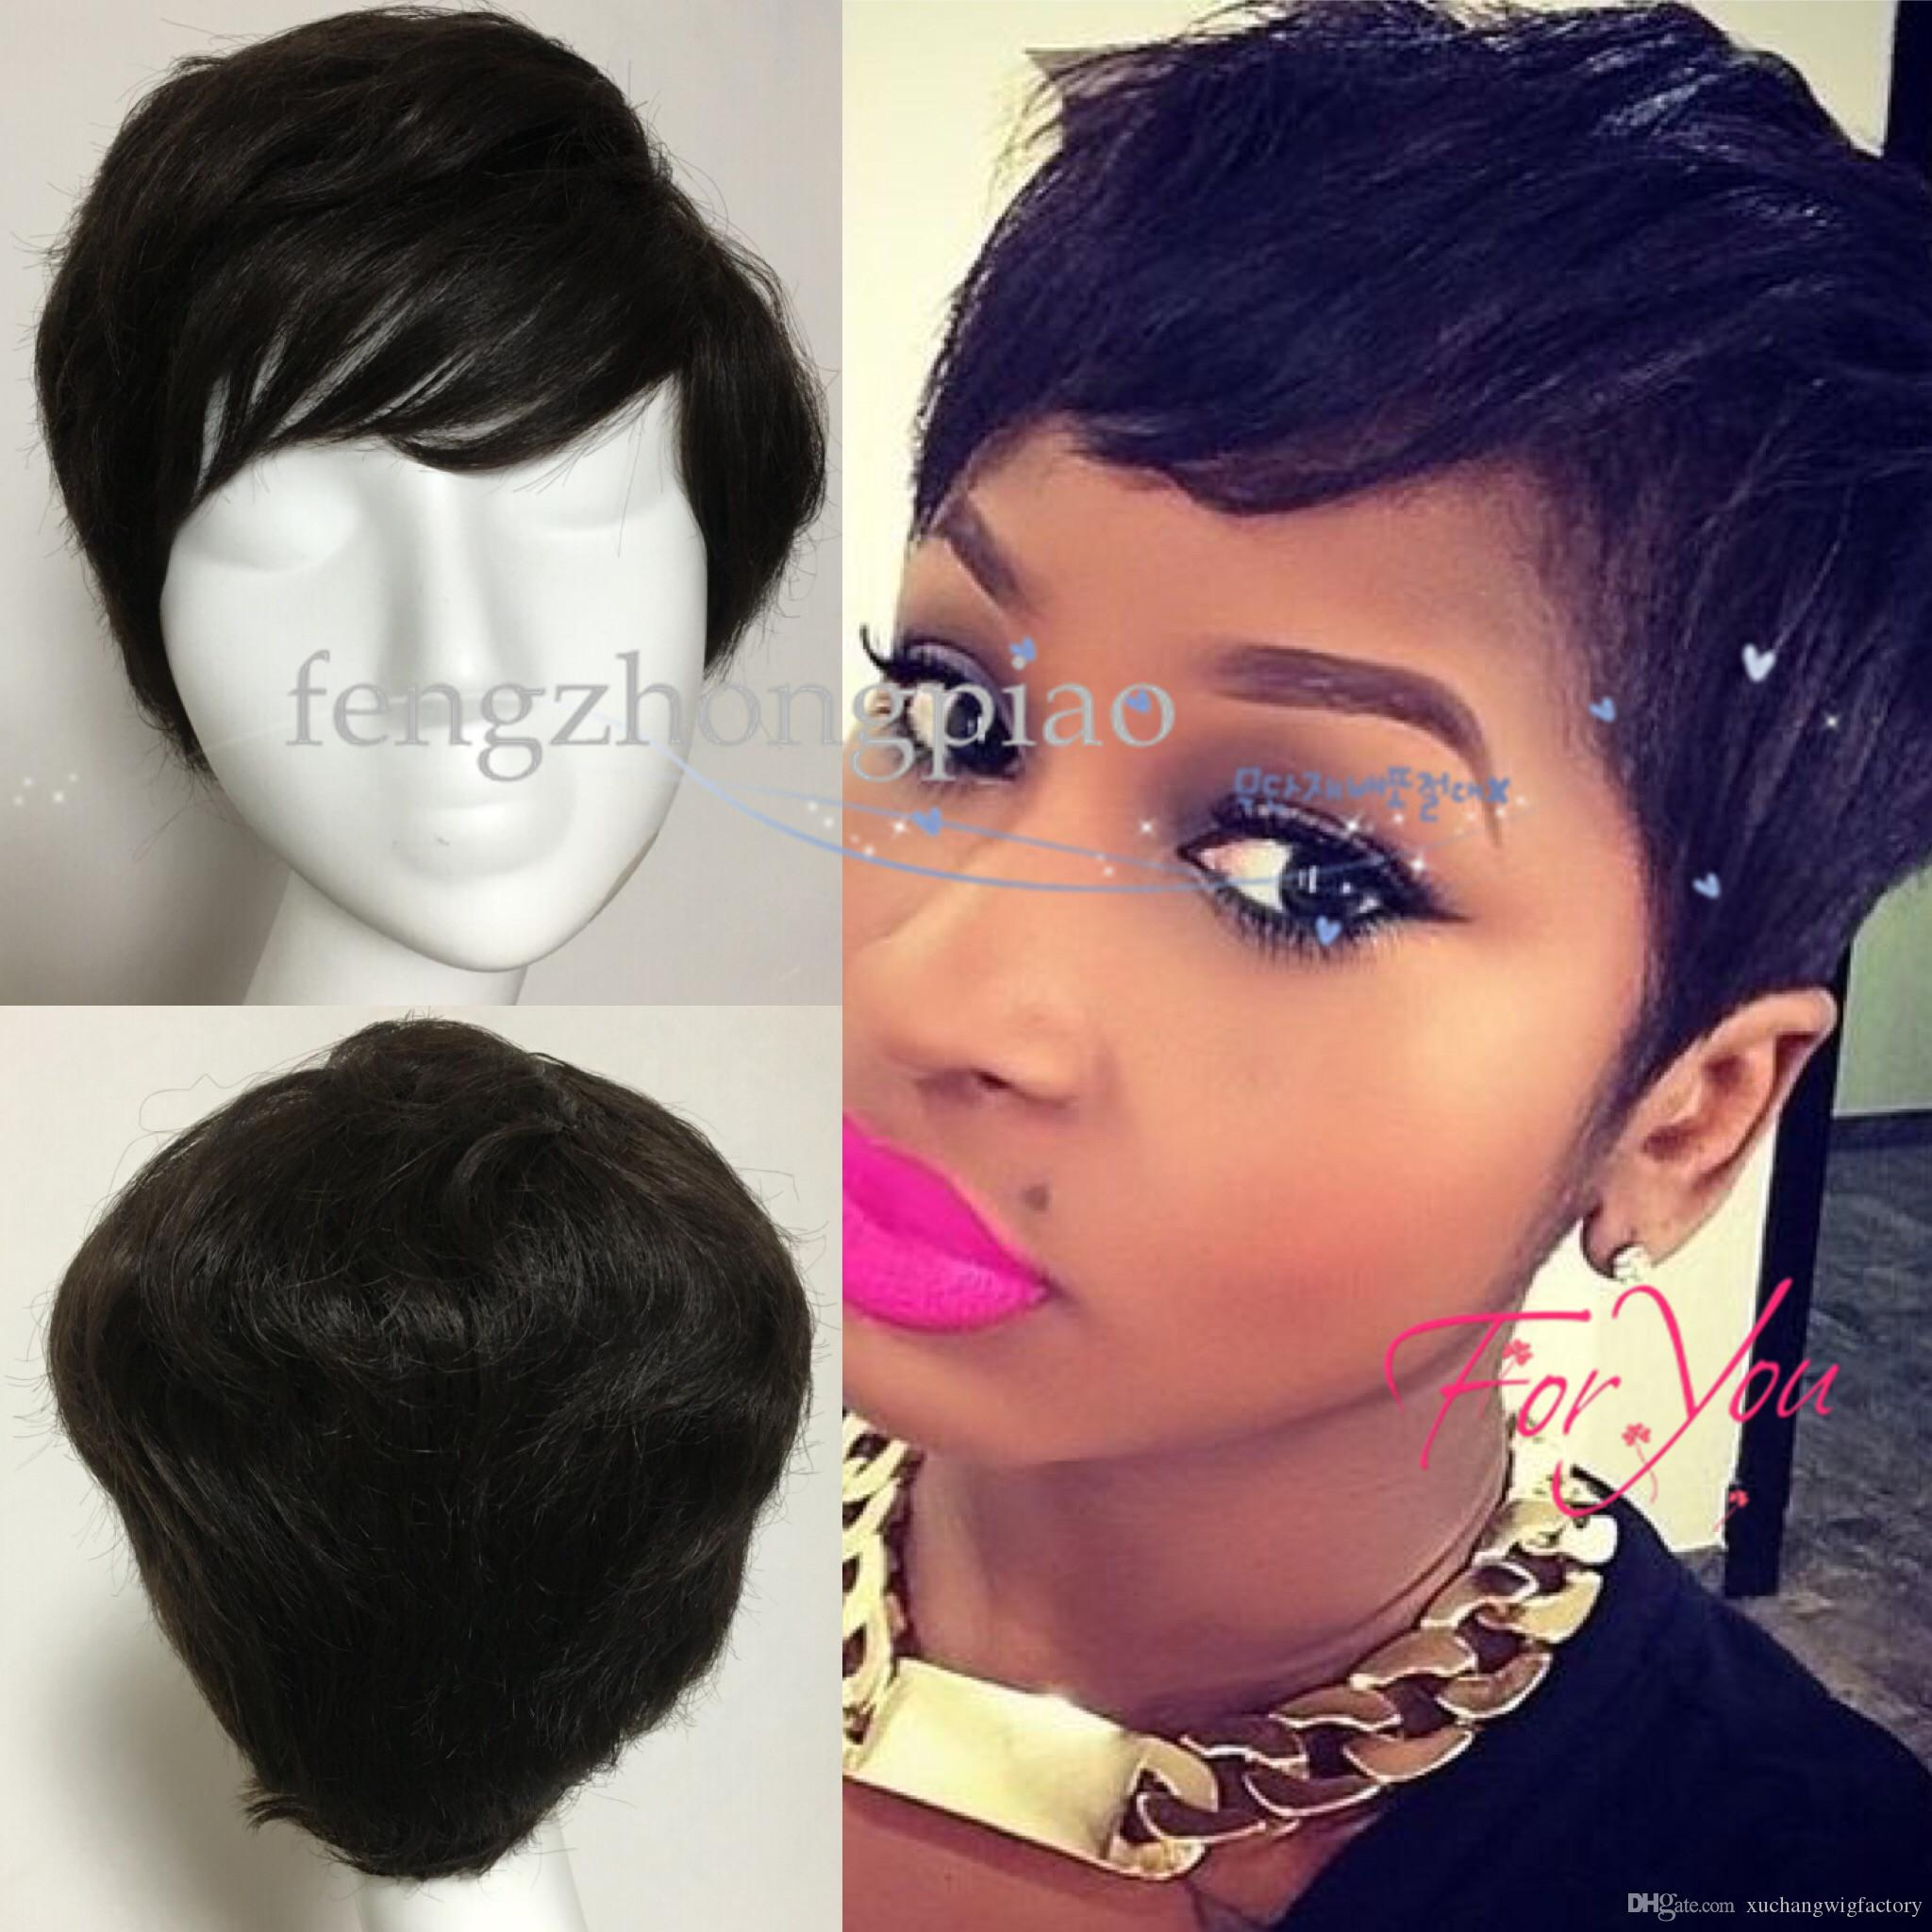 Black Pixie Cut Human Hair Wigs half-price hairstyles Full wigs short hair Brazilian virgin human hair wigs for black women